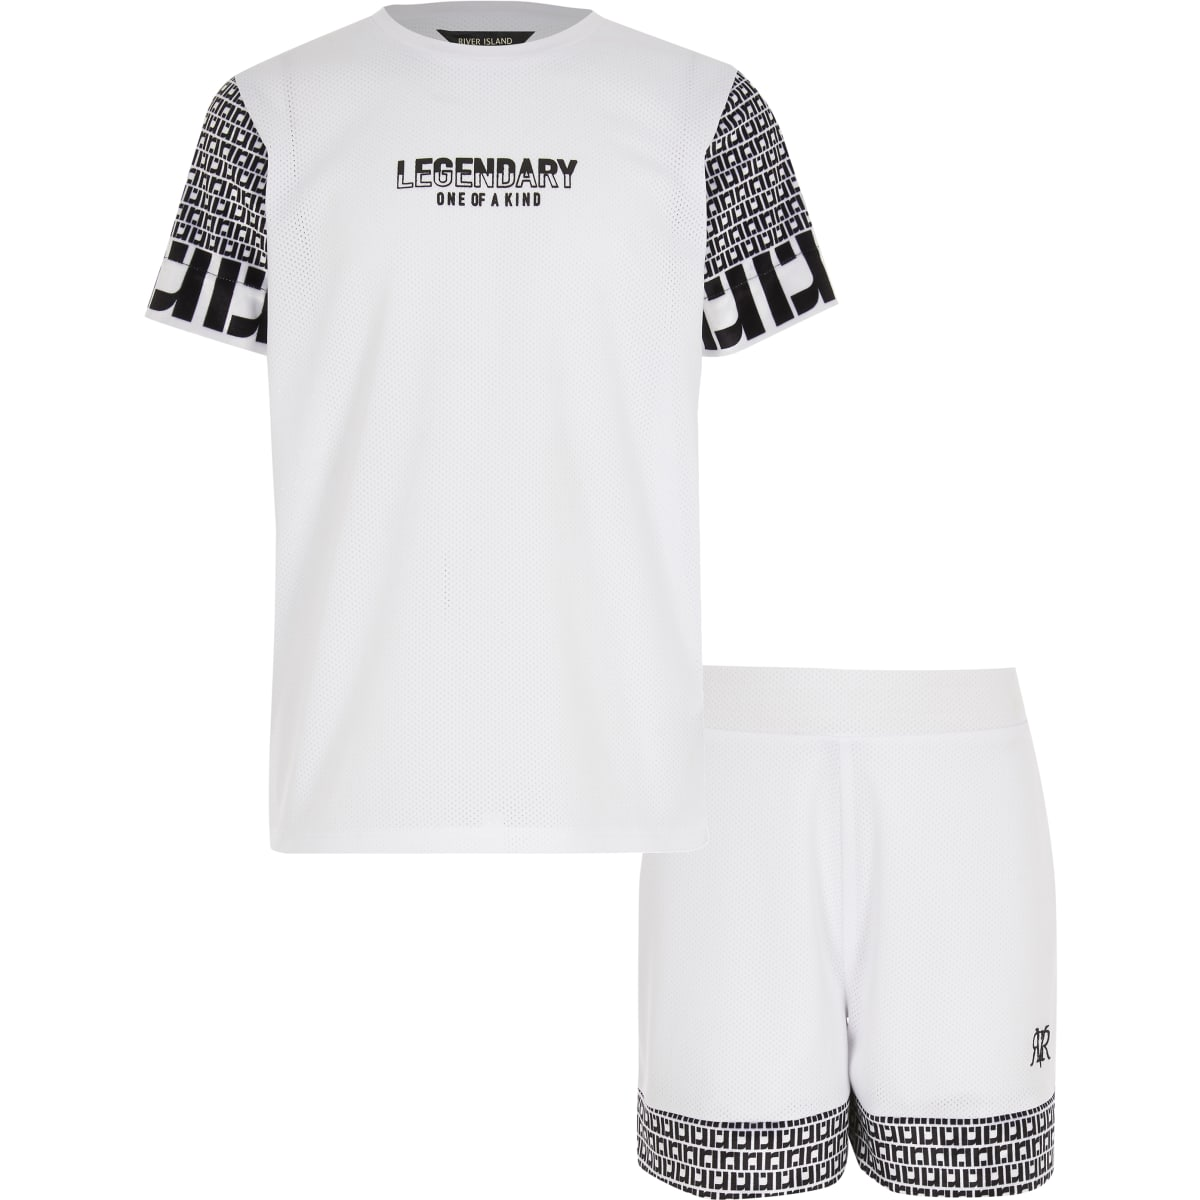 Boys RI 'legendary' print T-shirt outfit